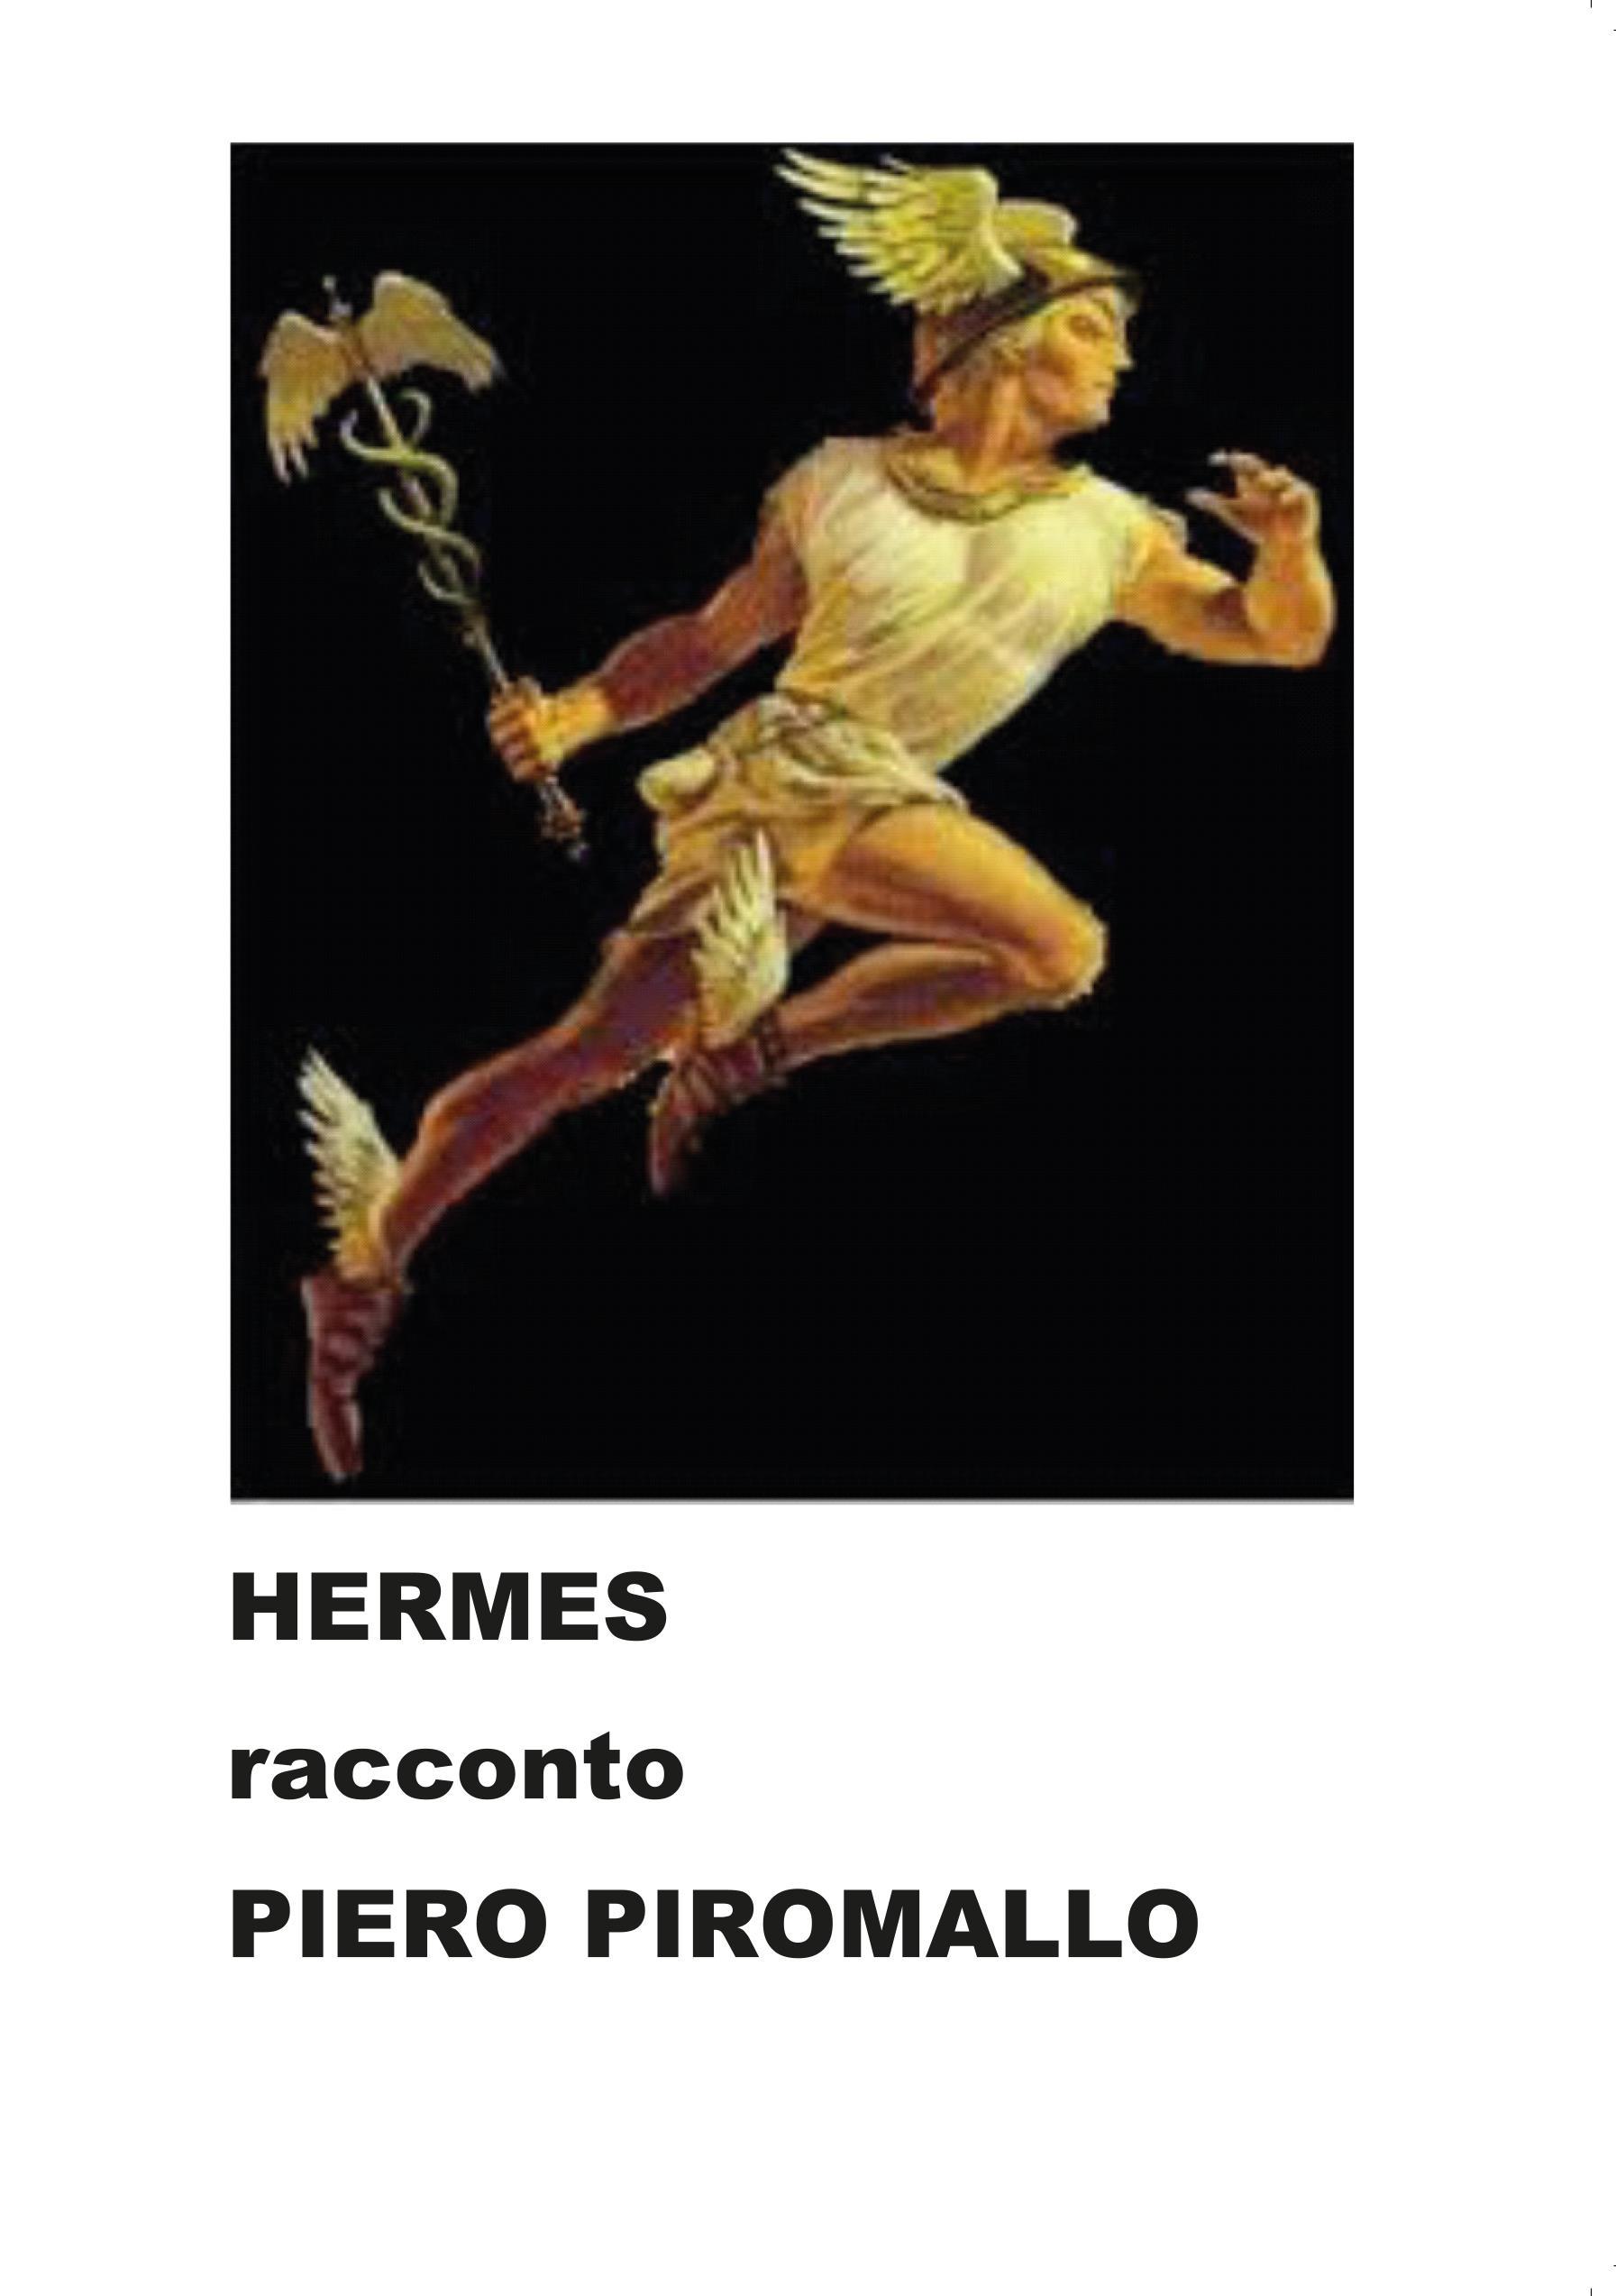 HERMES racconto